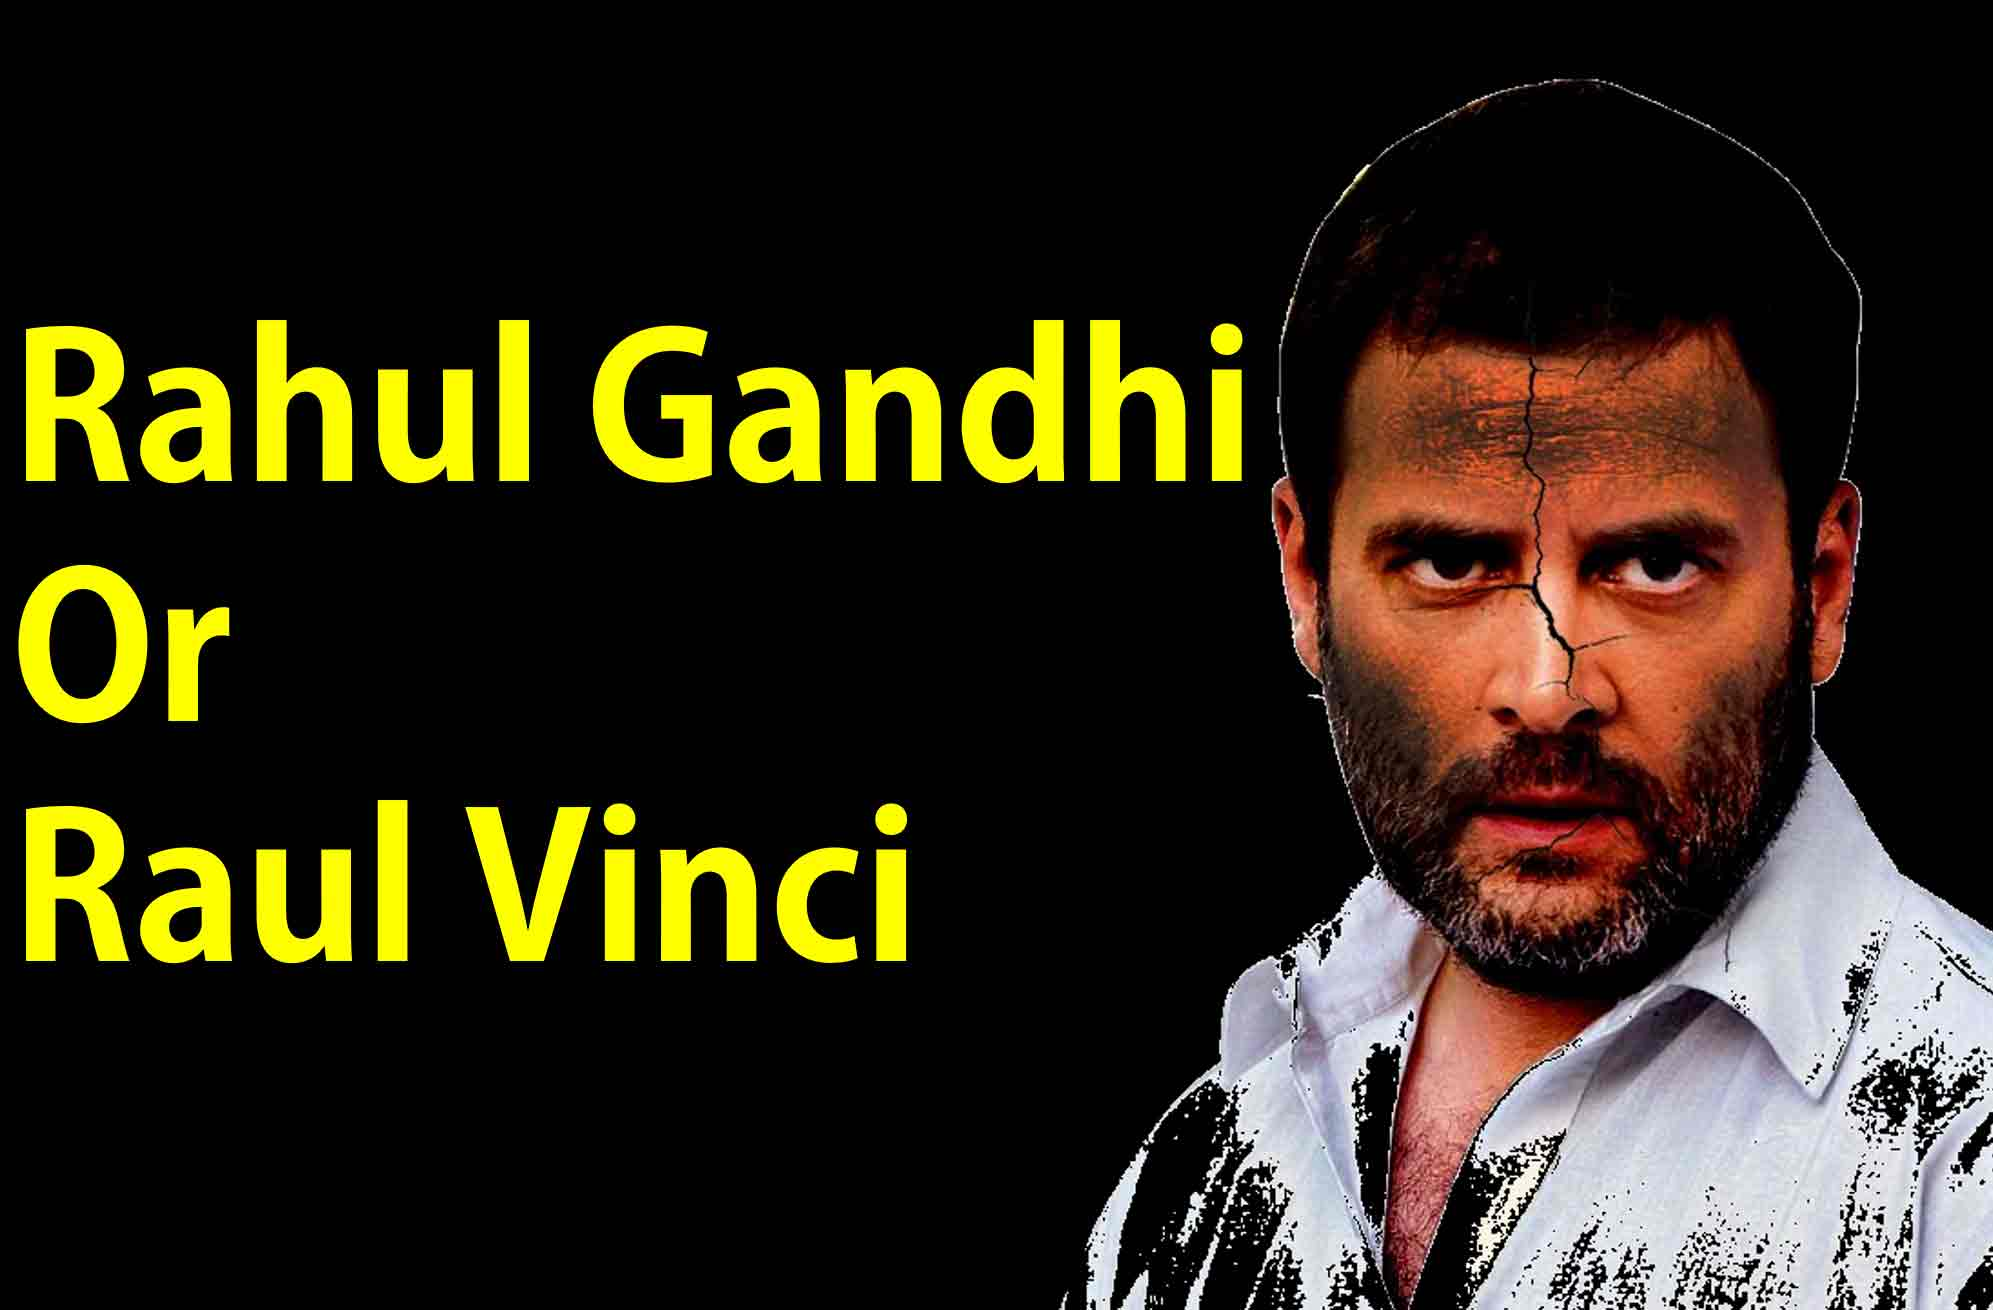 Rahul Gandhi or Raul Vinci?, From InText